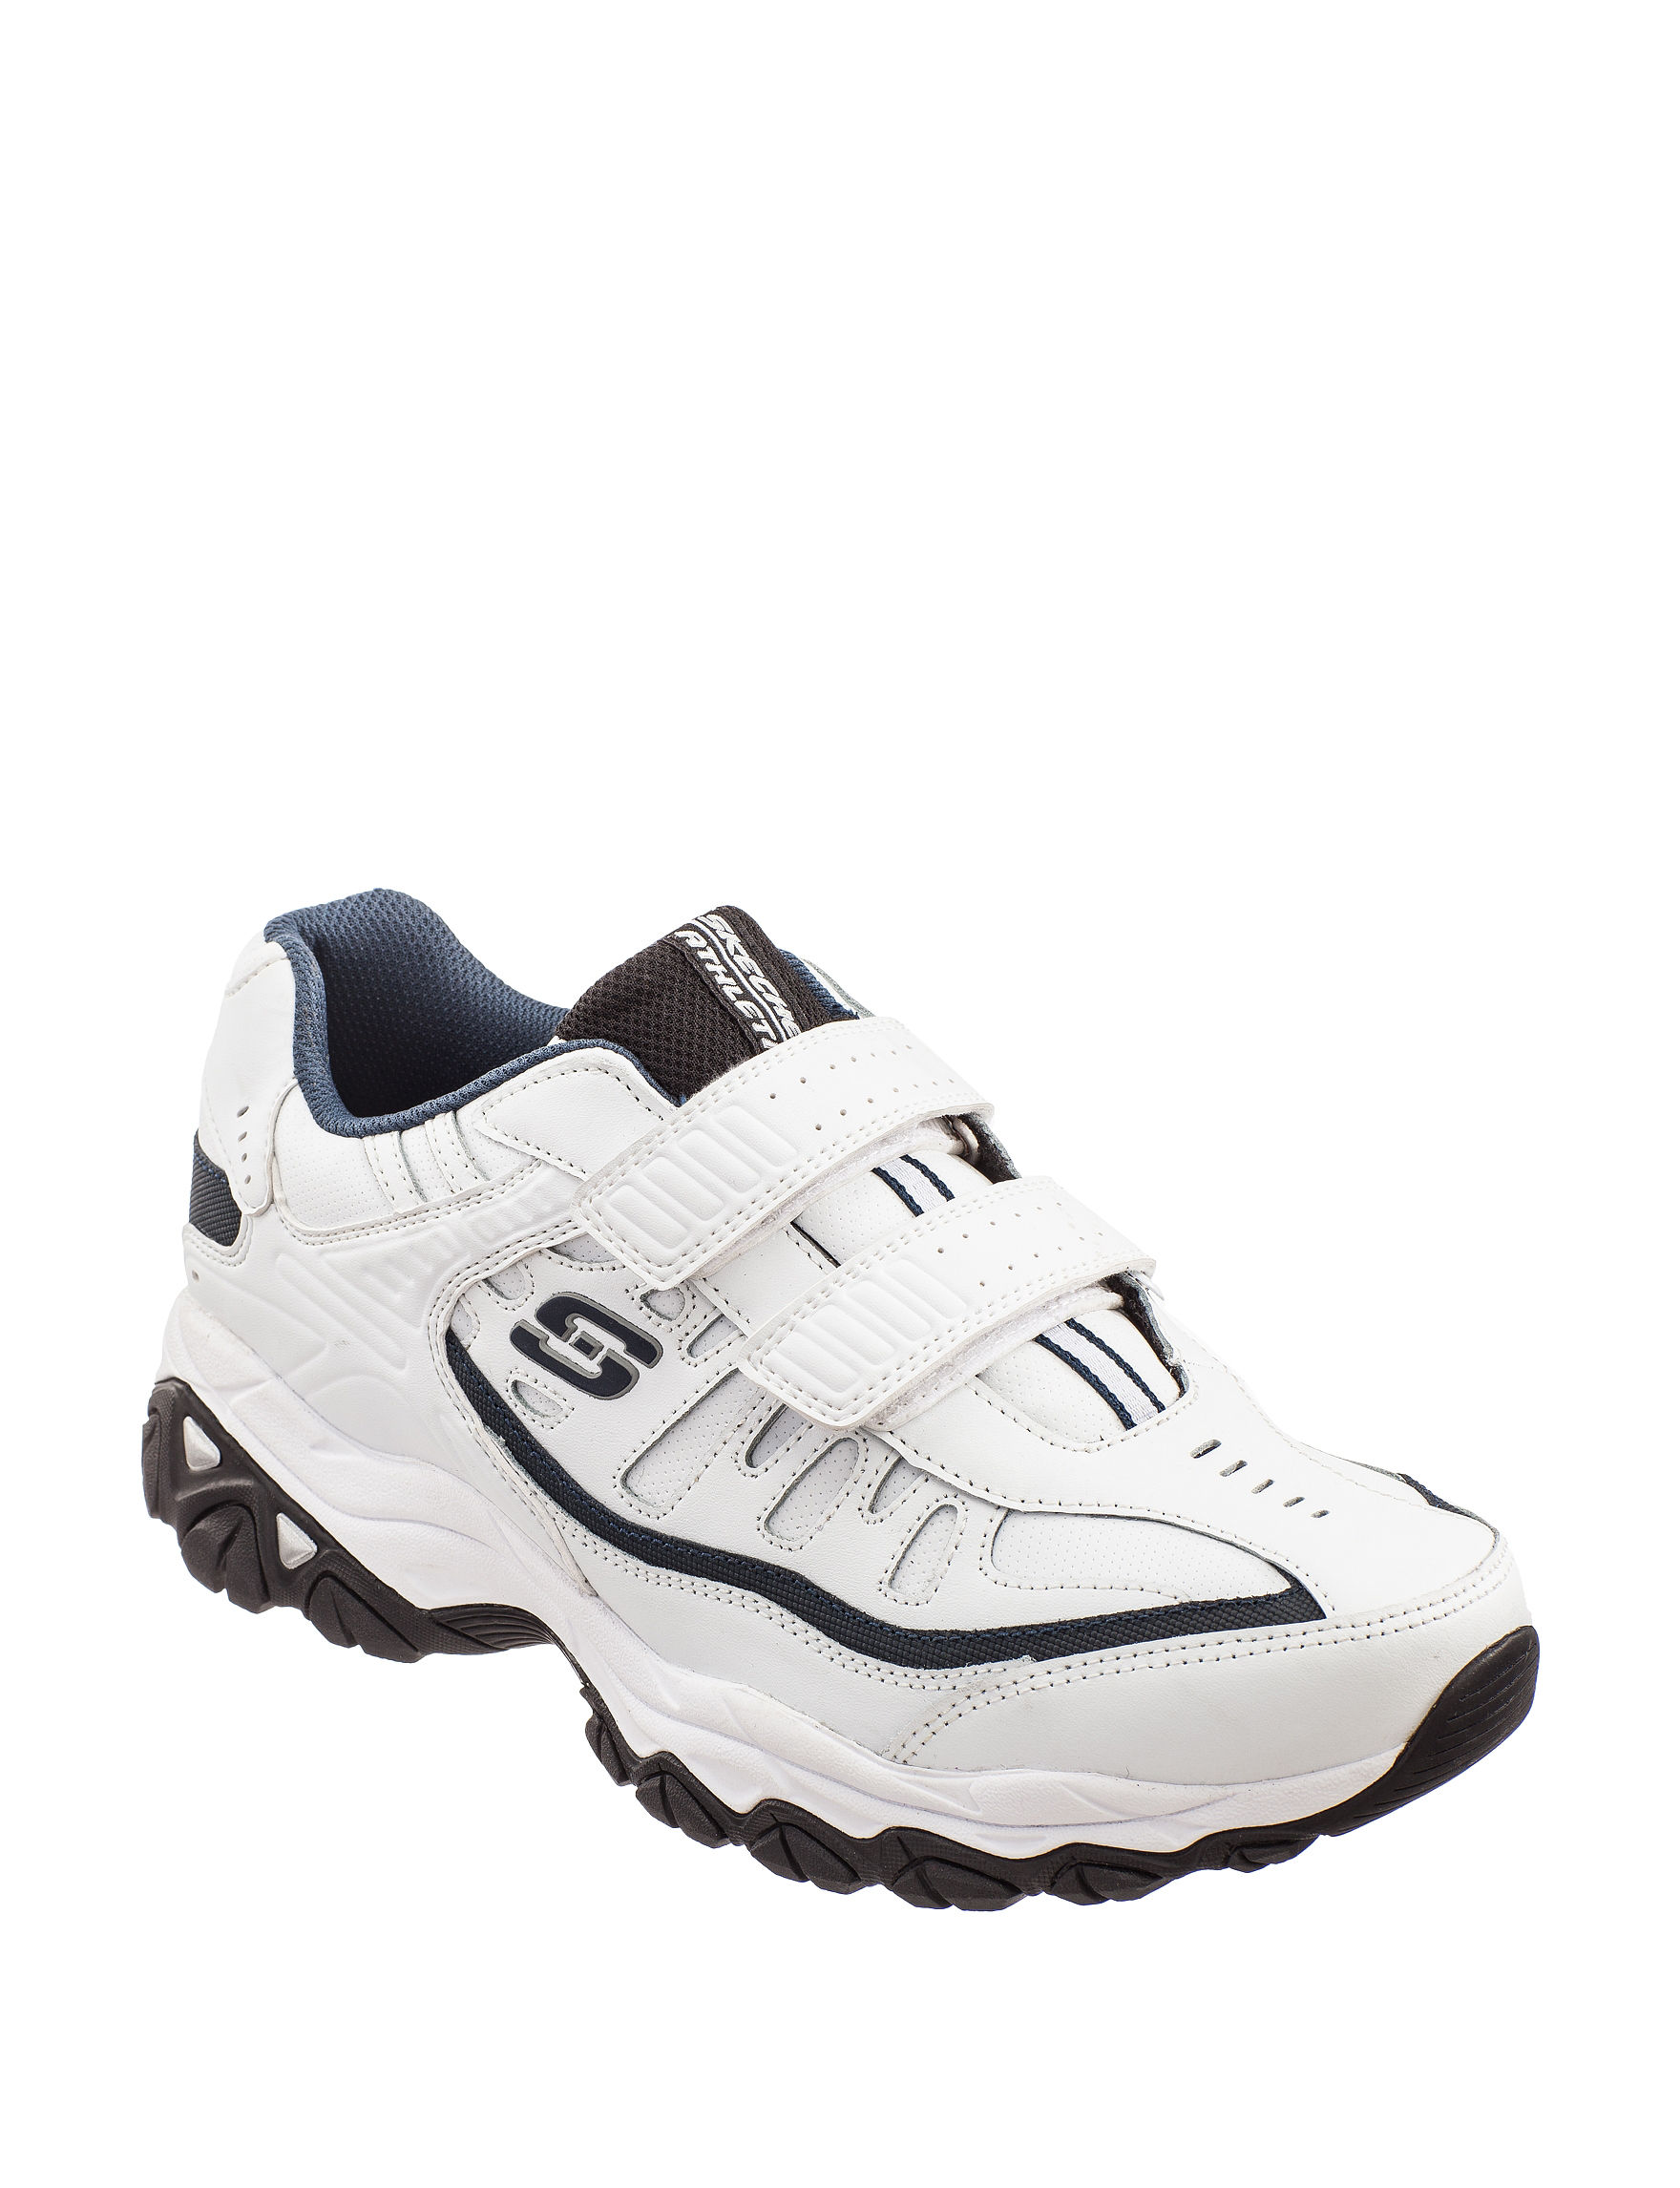 Skechers White / Navy